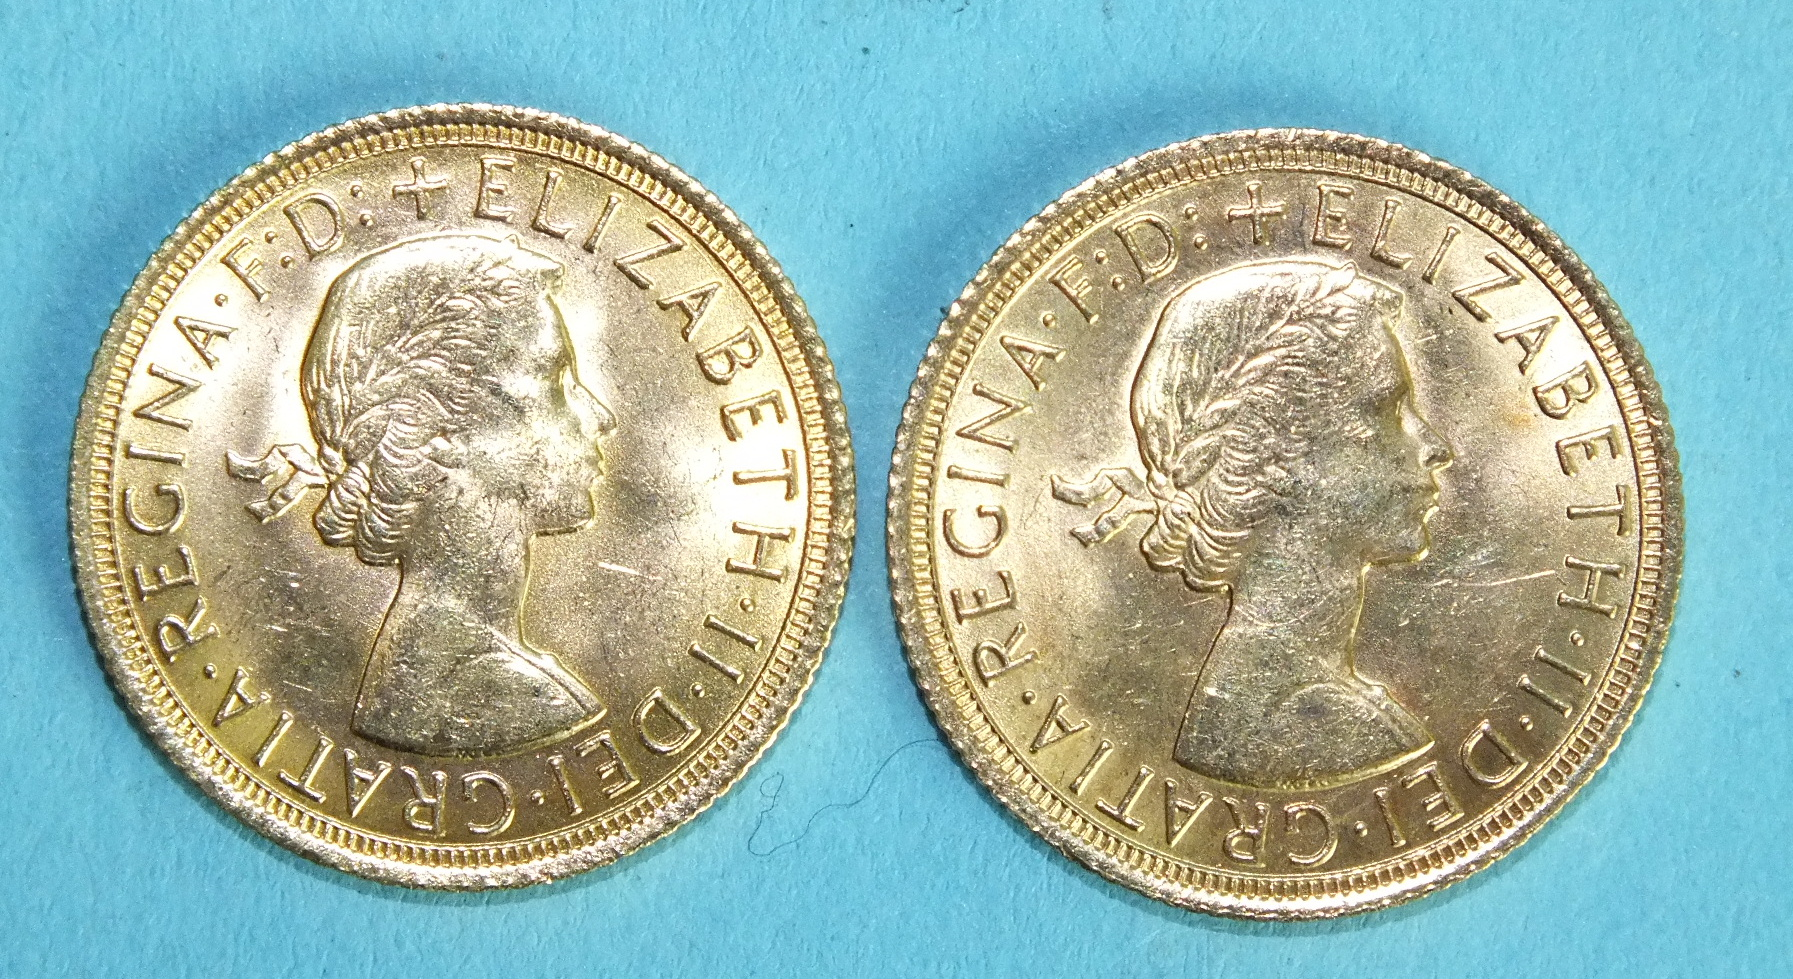 Lot 380 - Two Elizabeth II 1968 sovereigns, (2).